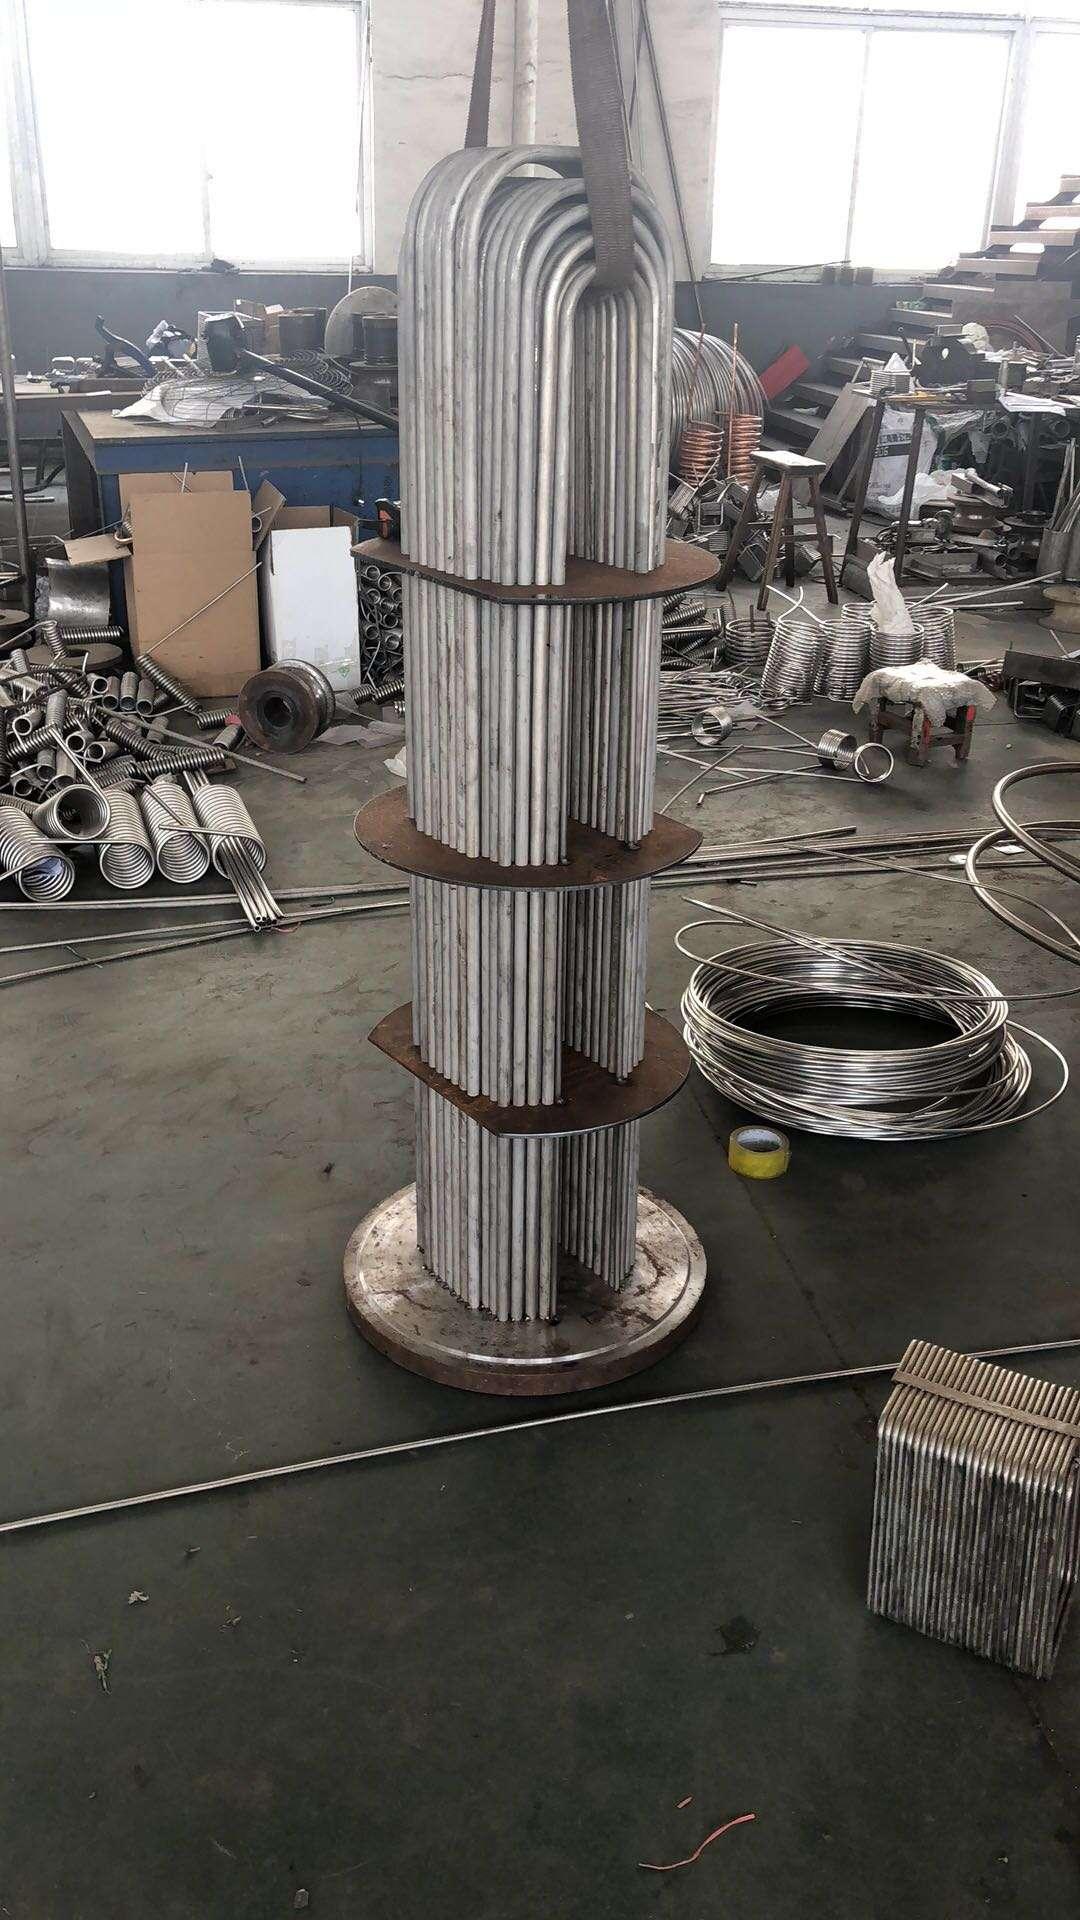 Tube in Tube evaporator Coaxial Heat Exchanger condenser 13